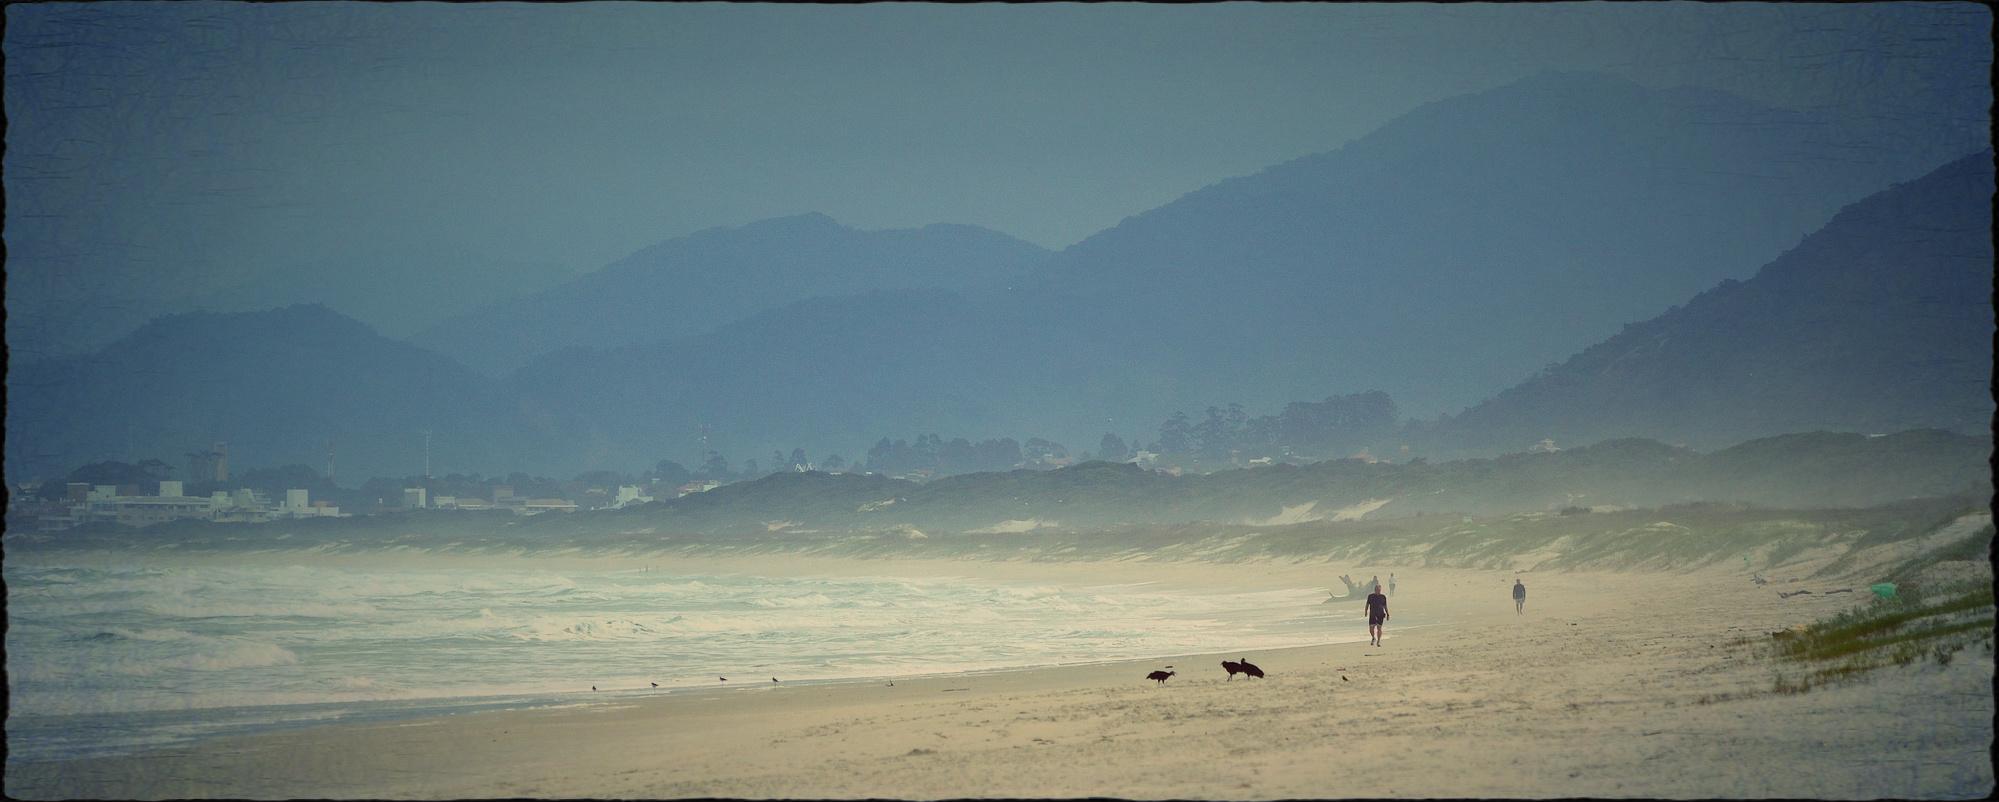 Praia Joaquina / Santa Catarina